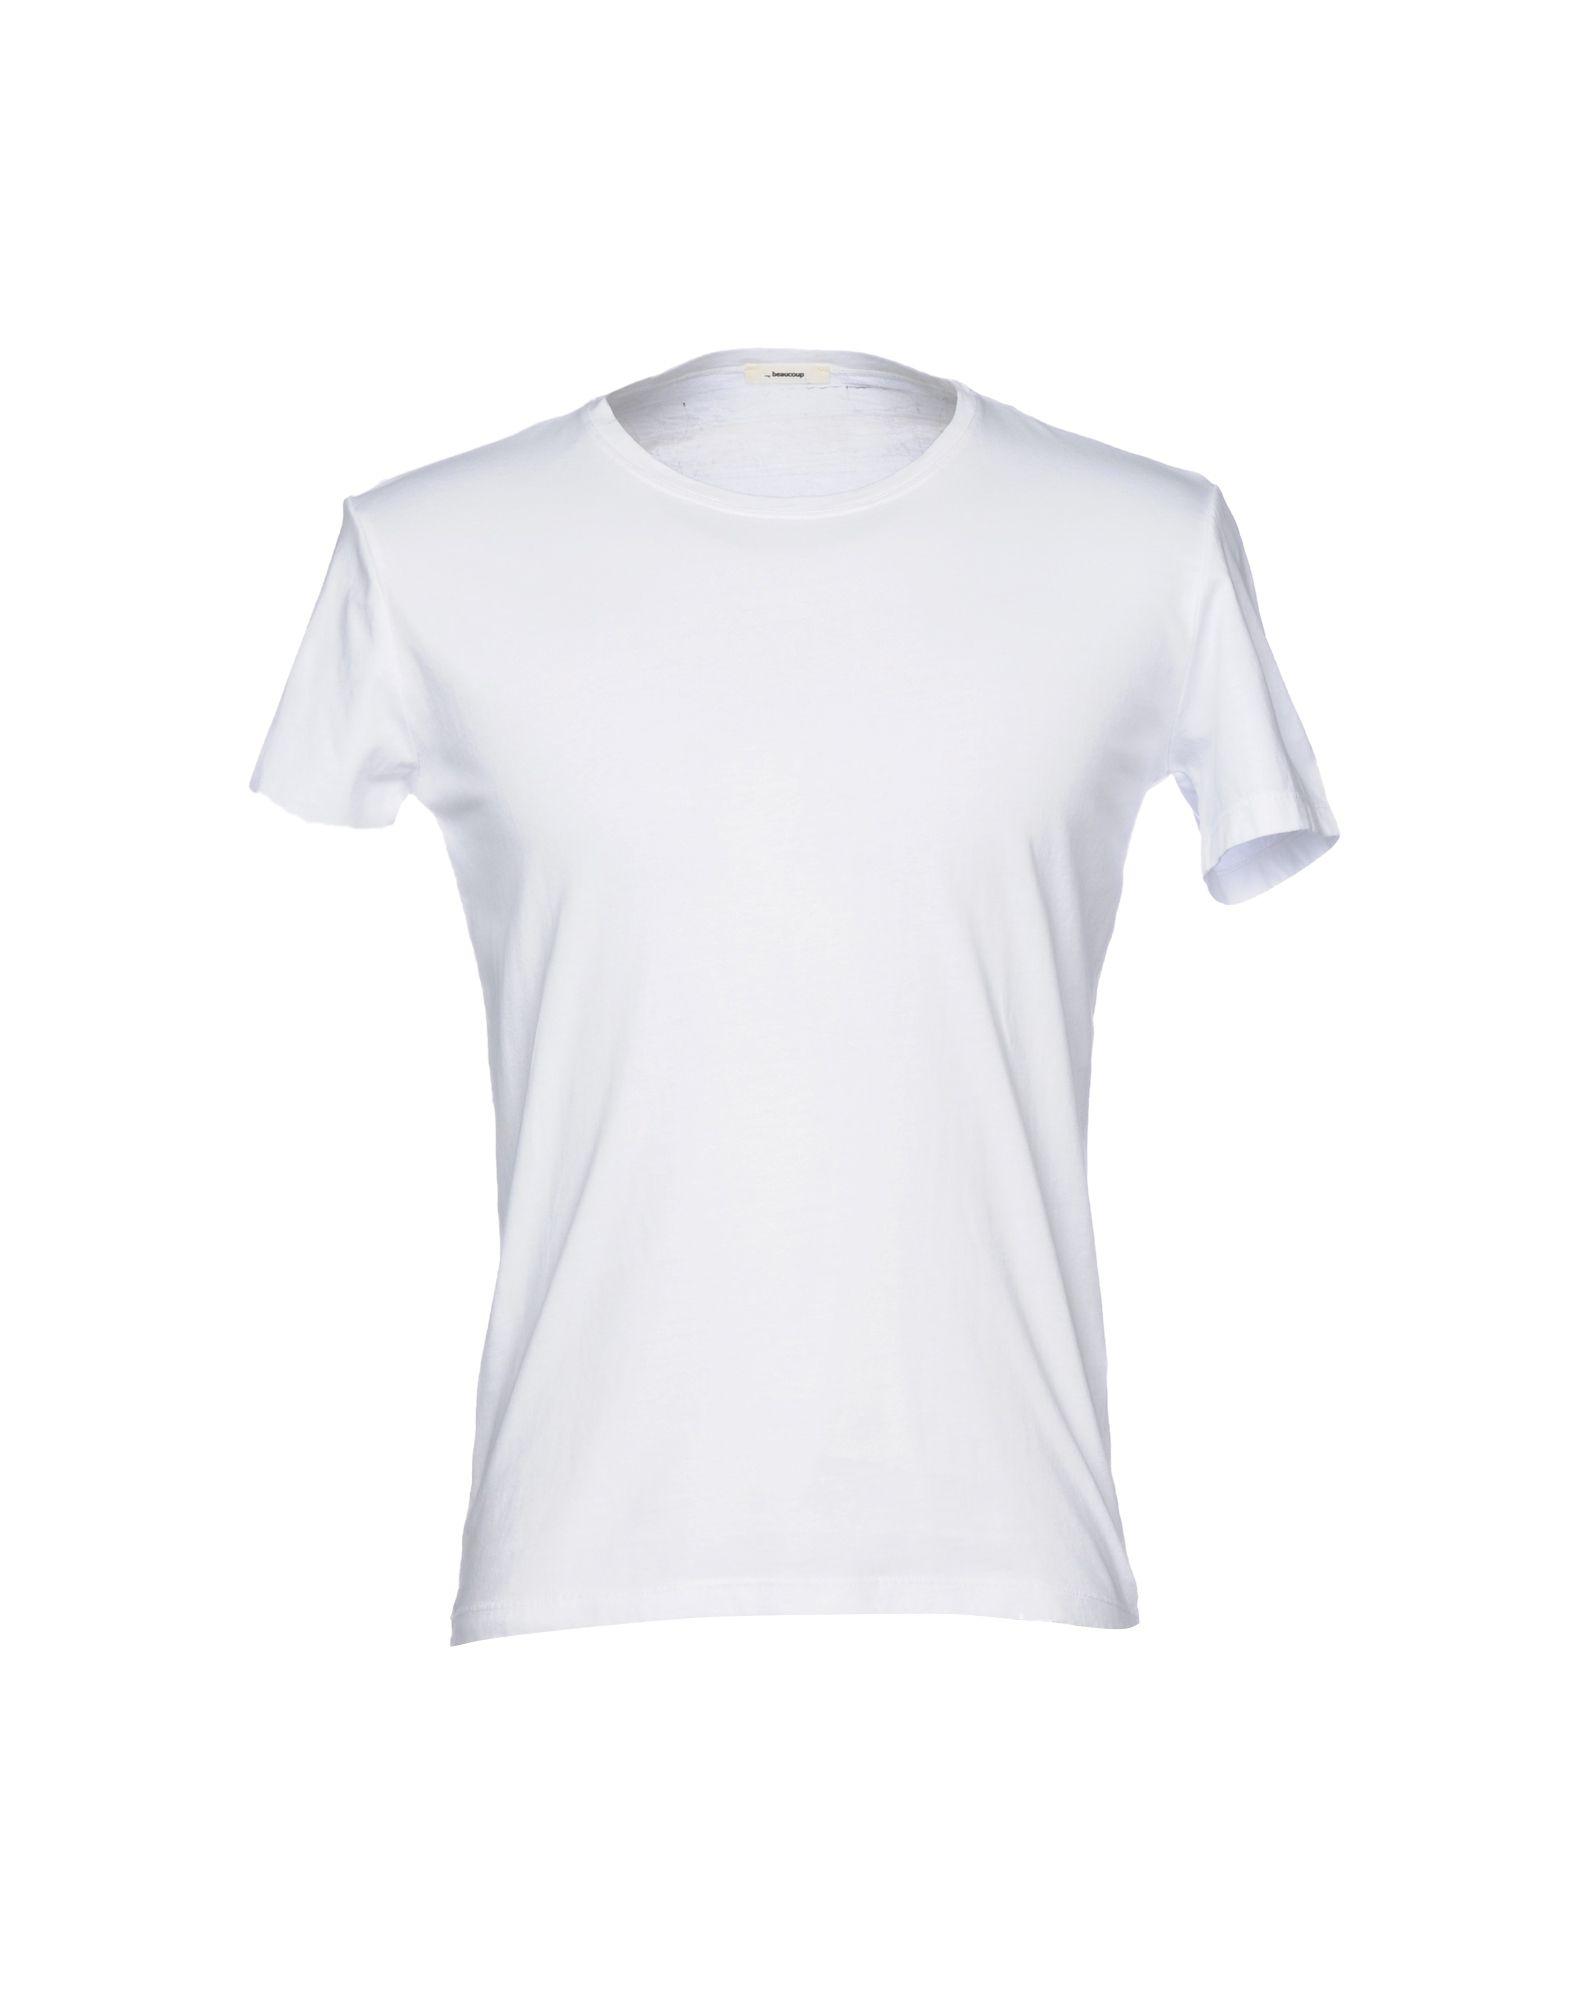 A buon mercato A A mercato buon mercato T-Shirt ..,Beaucoup Uomo - 12193225QE 953664